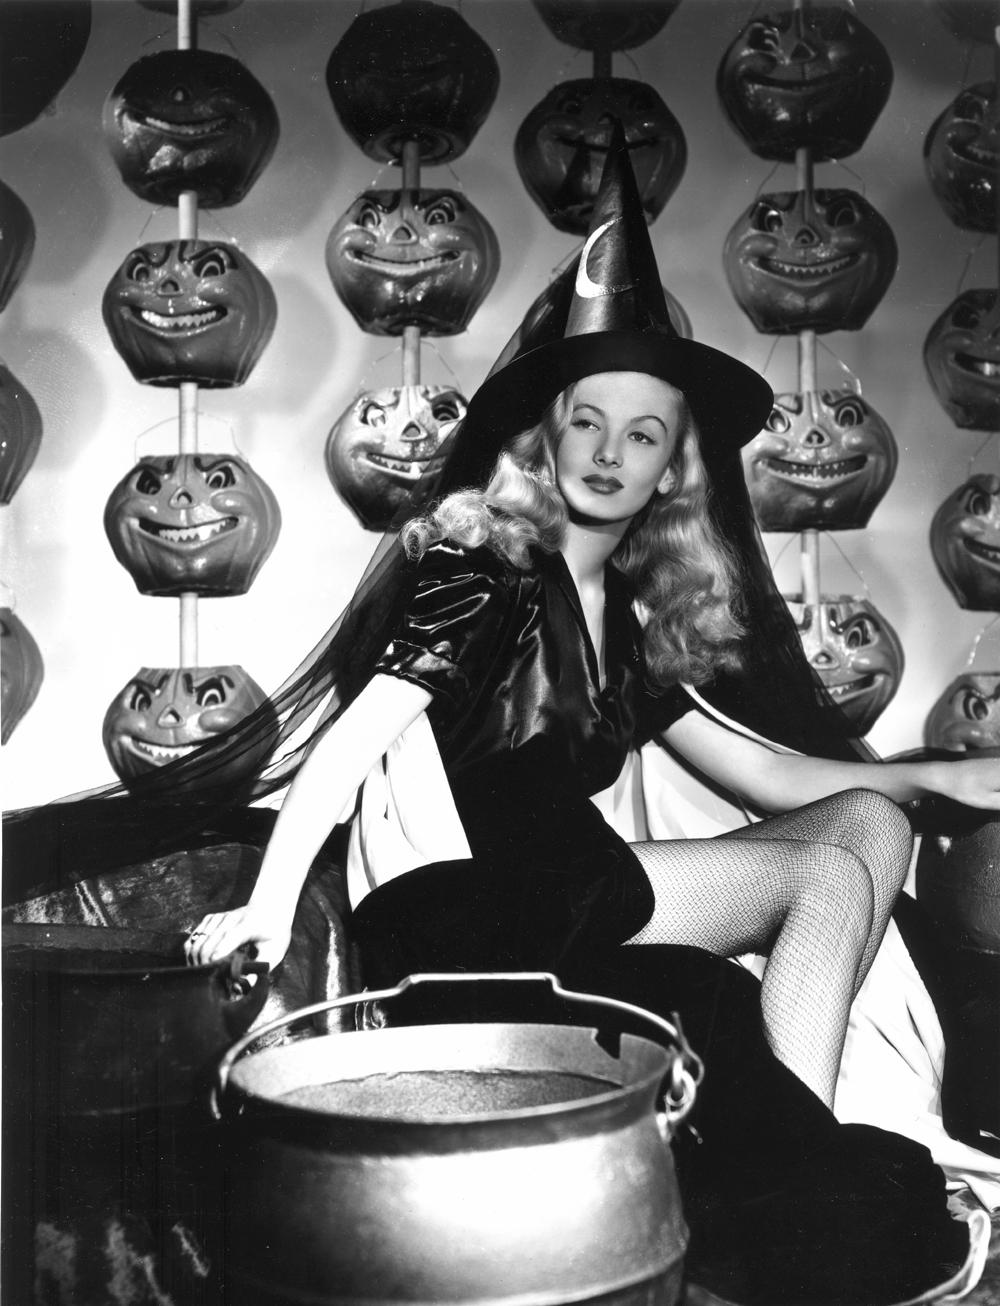 http://2.bp.blogspot.com/--eErUK8CDC4/Tqhn3gkYnNI/AAAAAAAAWtk/uh6psjyHtUg/s1600/I+Married+a+Witch+%281%29.jpg